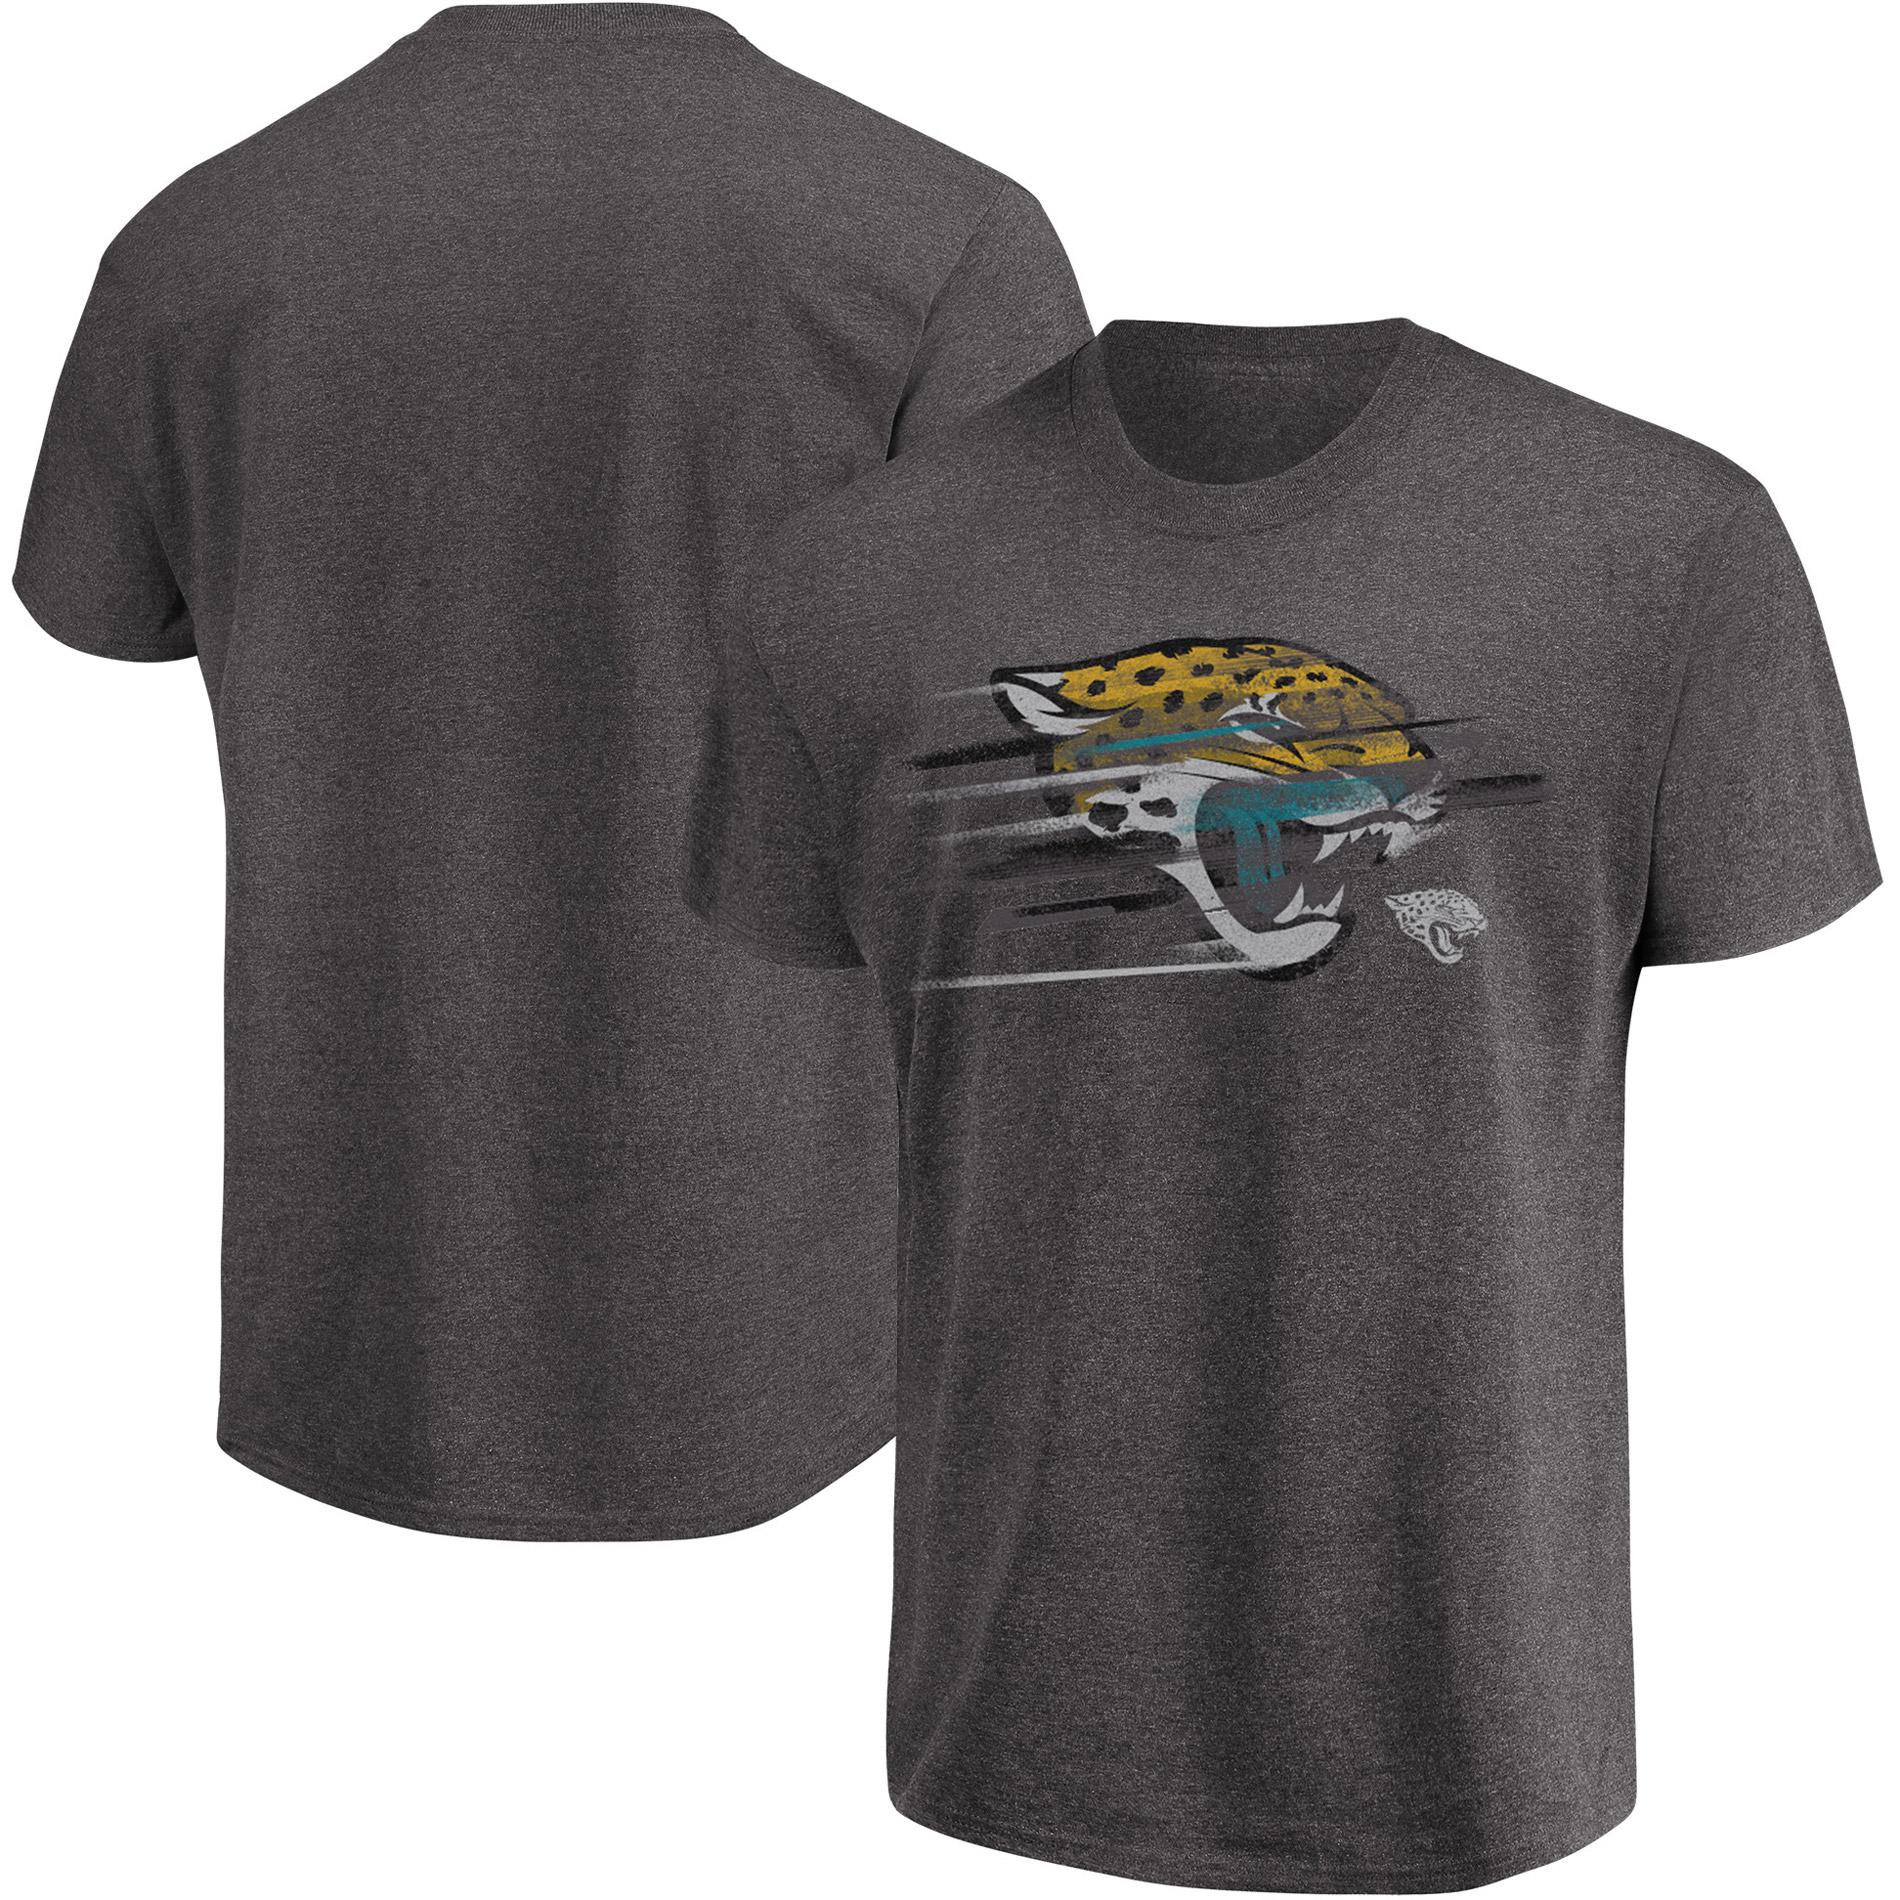 Jacksonville Jaguars Majestic Fierce Intensity T-Shirt - Heathered Charcoal